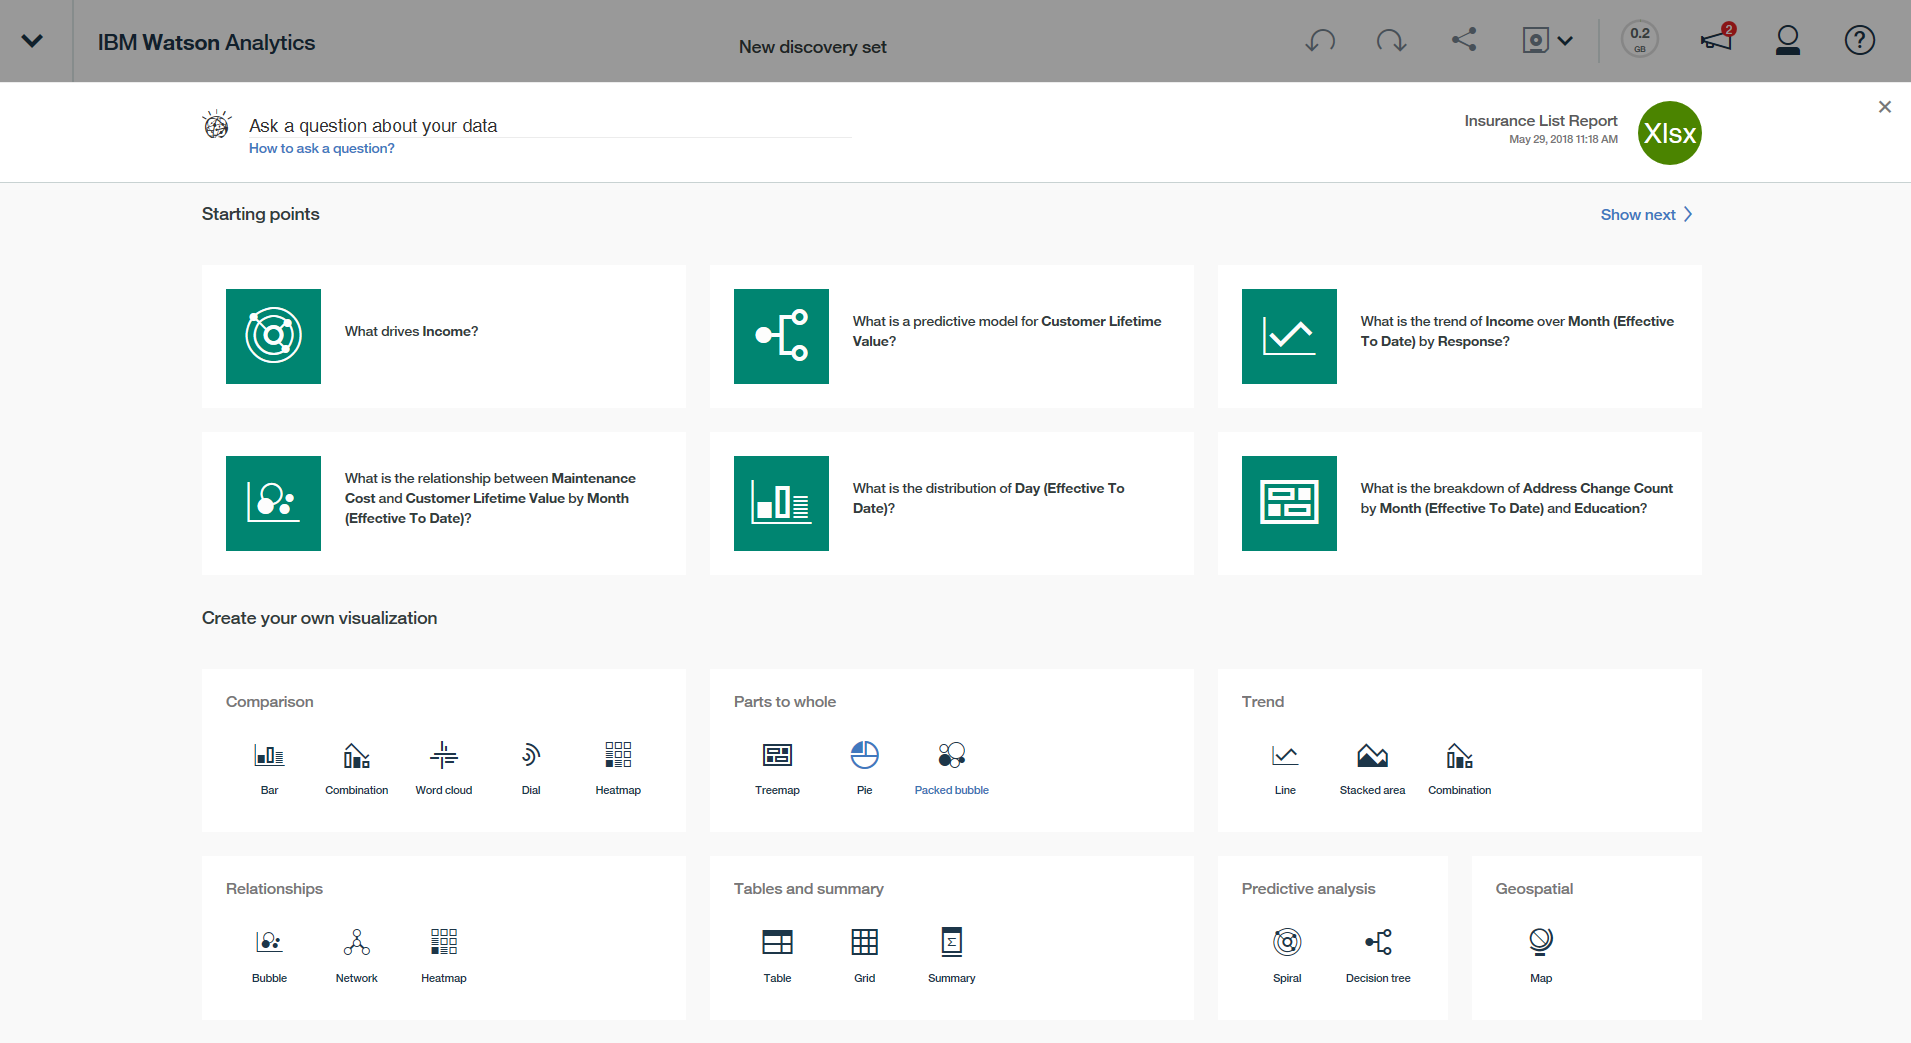 IBM Watson Analytics Demo - Starting Points